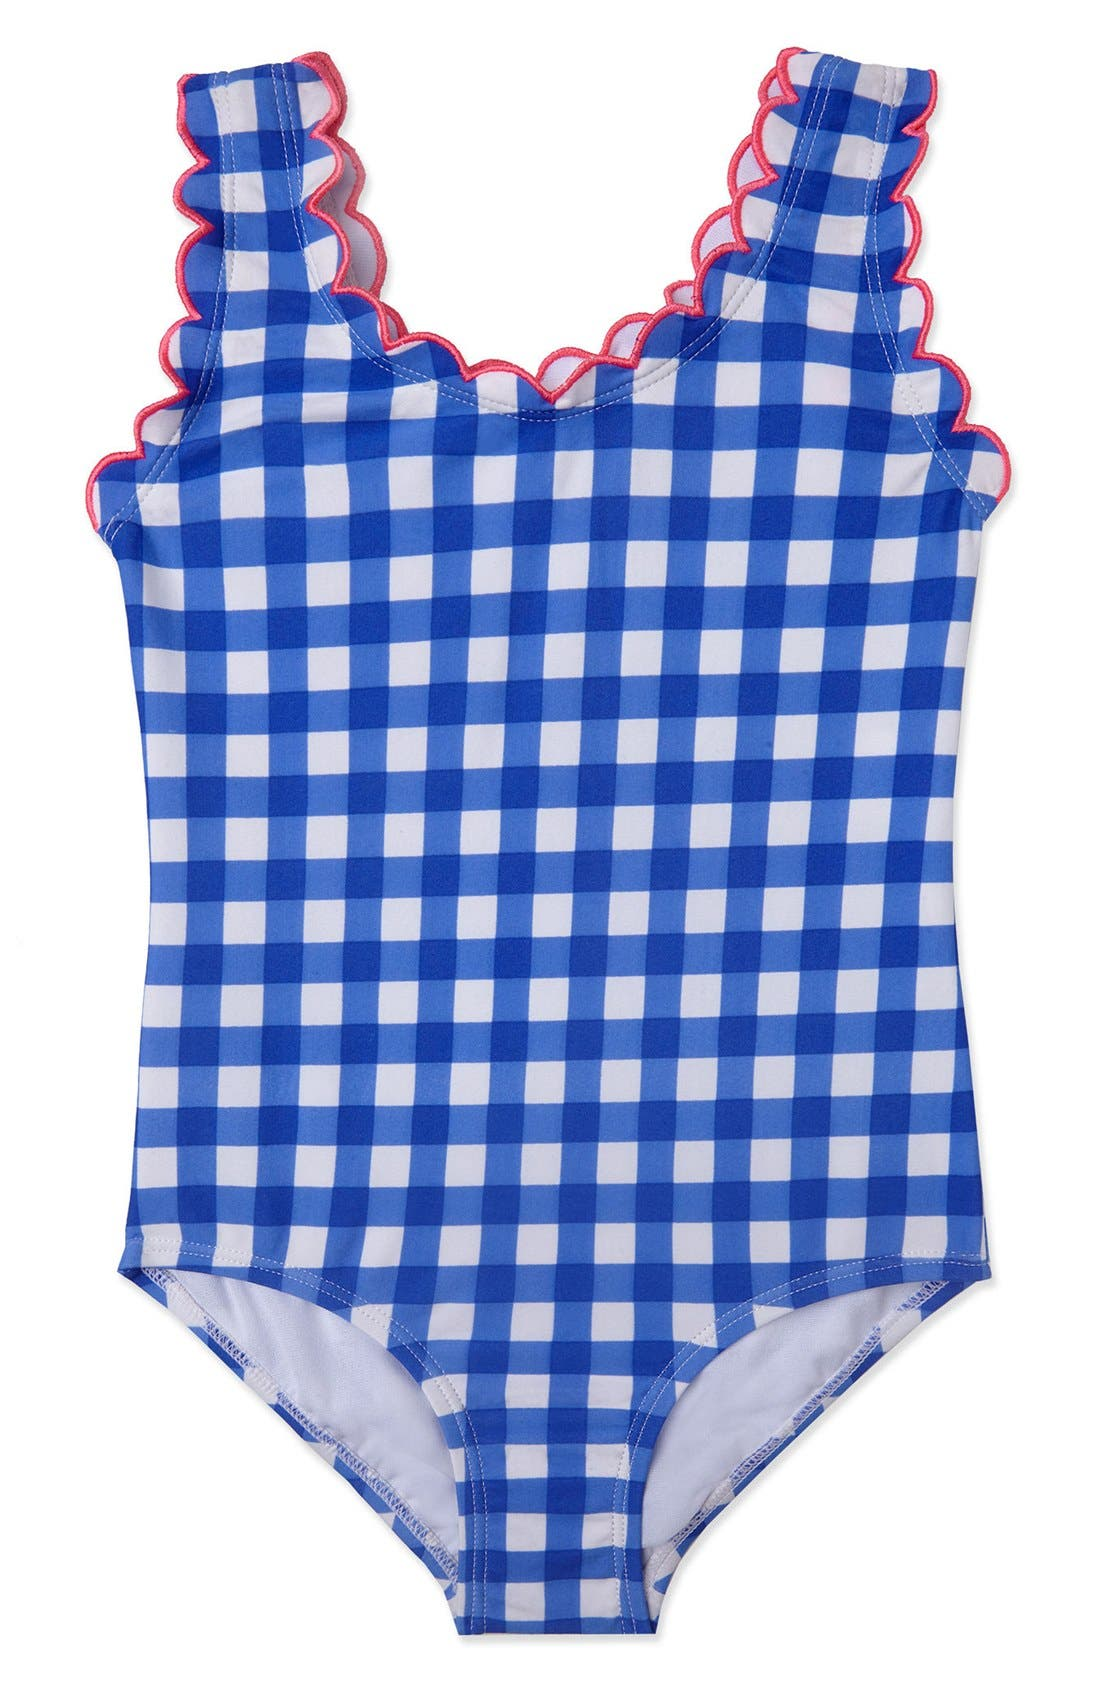 Main Image - Hula Star 'Summer Skies' One-Piece Swimsuit (Toddler Girls & Little Girls)